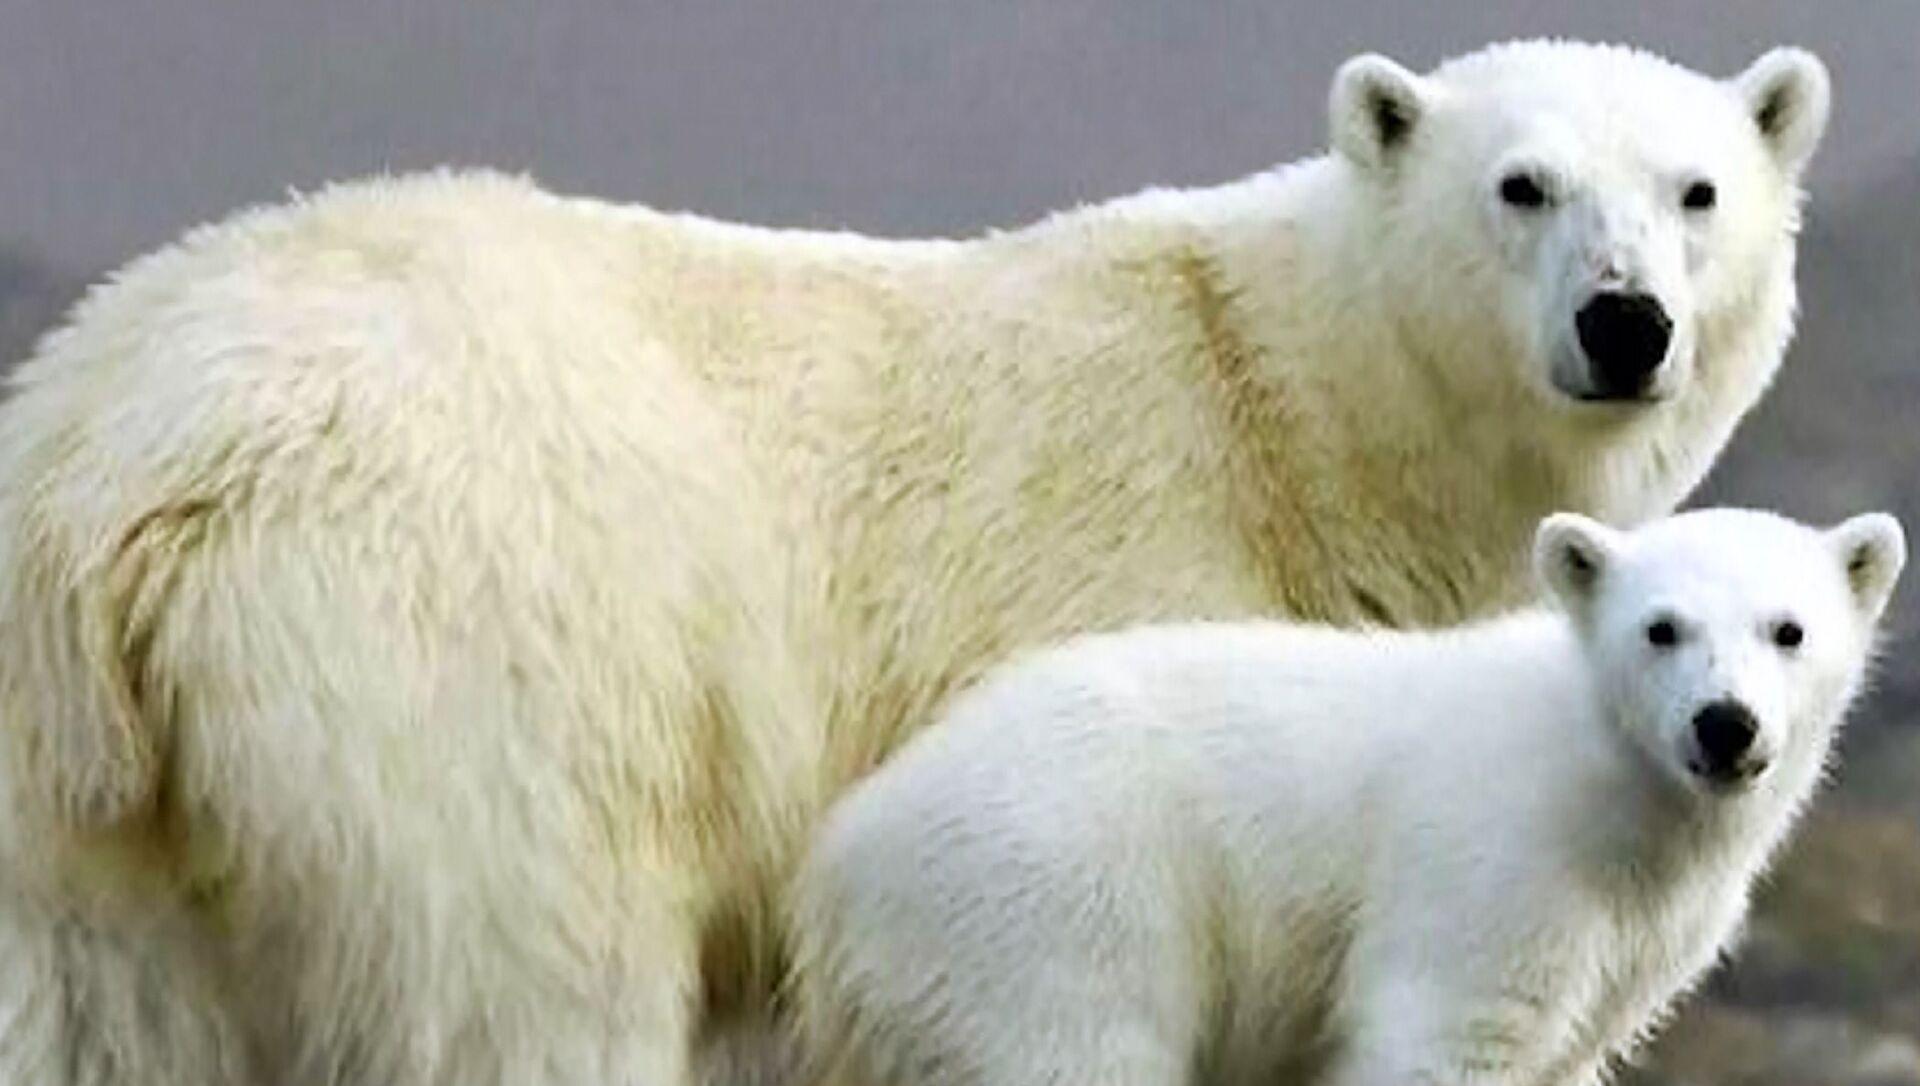 Giornata mondiale dell'orso polare: i grandi predatori chiedono aiuto   - Sputnik Italia, 1920, 27.02.2021